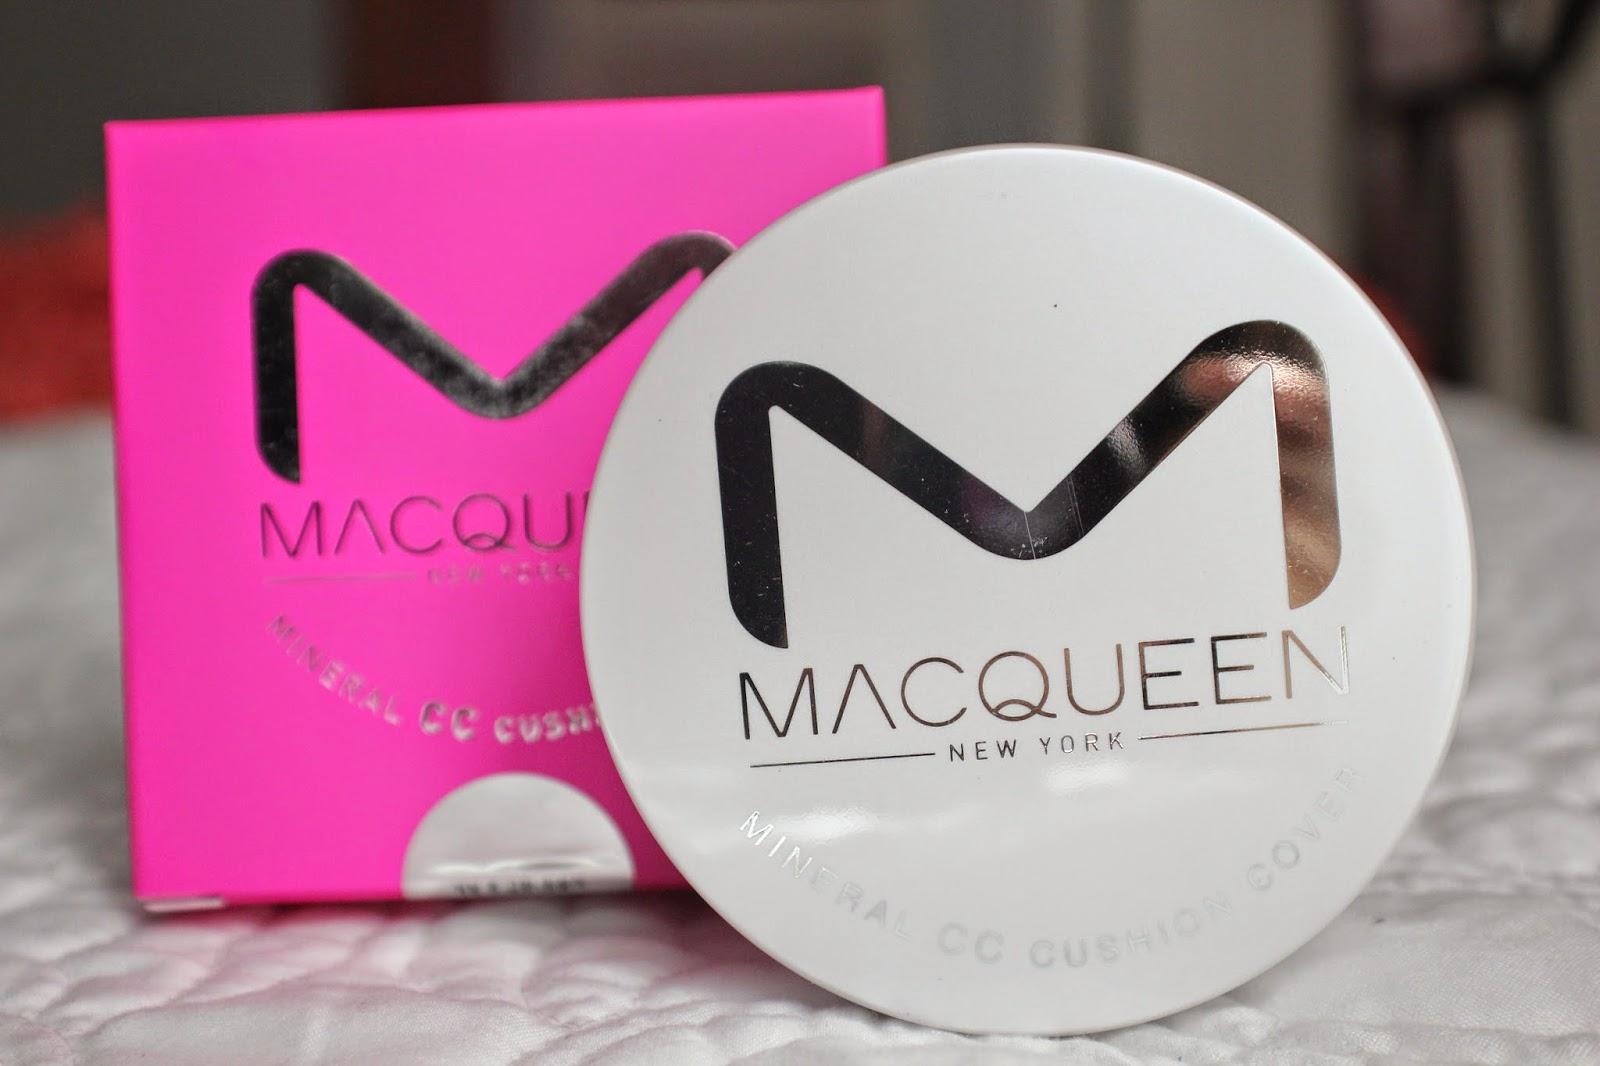 Macqueen New York CC Cushion ของแท้ 100% เบอร์ 21